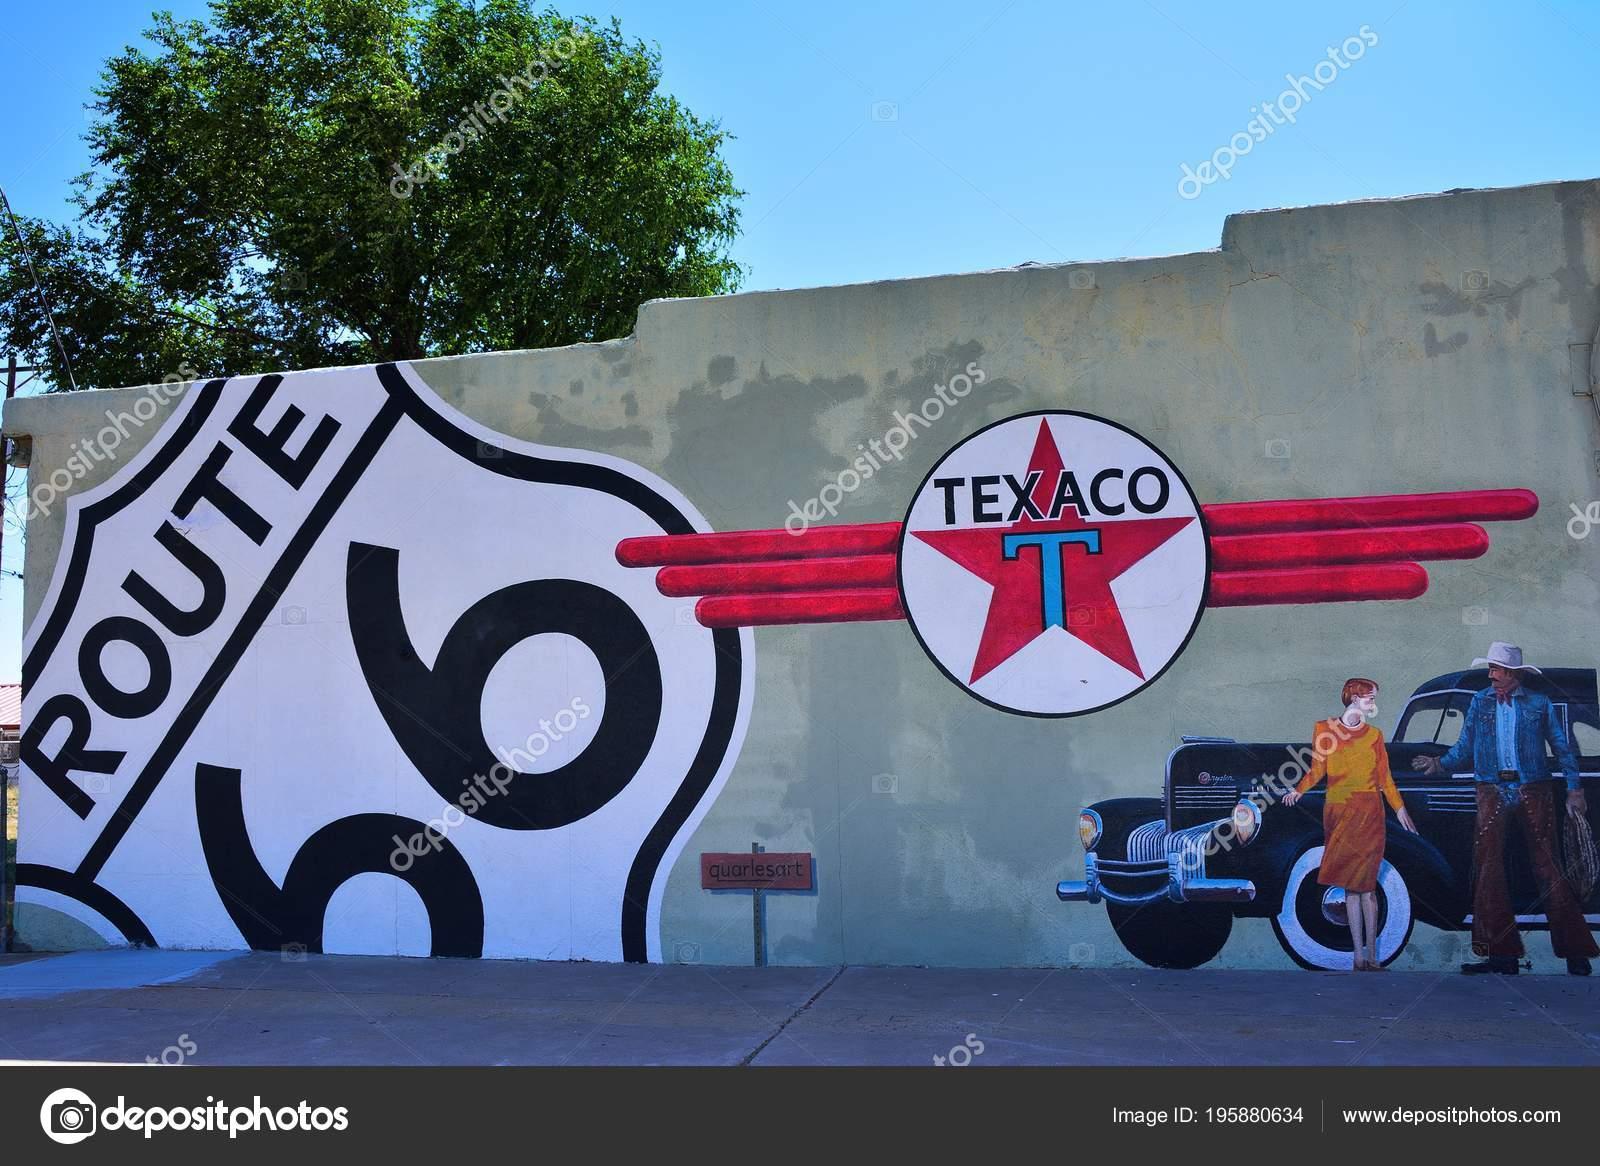 Tucumcari New Mexico July 2017 Texaco Gas Station Tucumcari